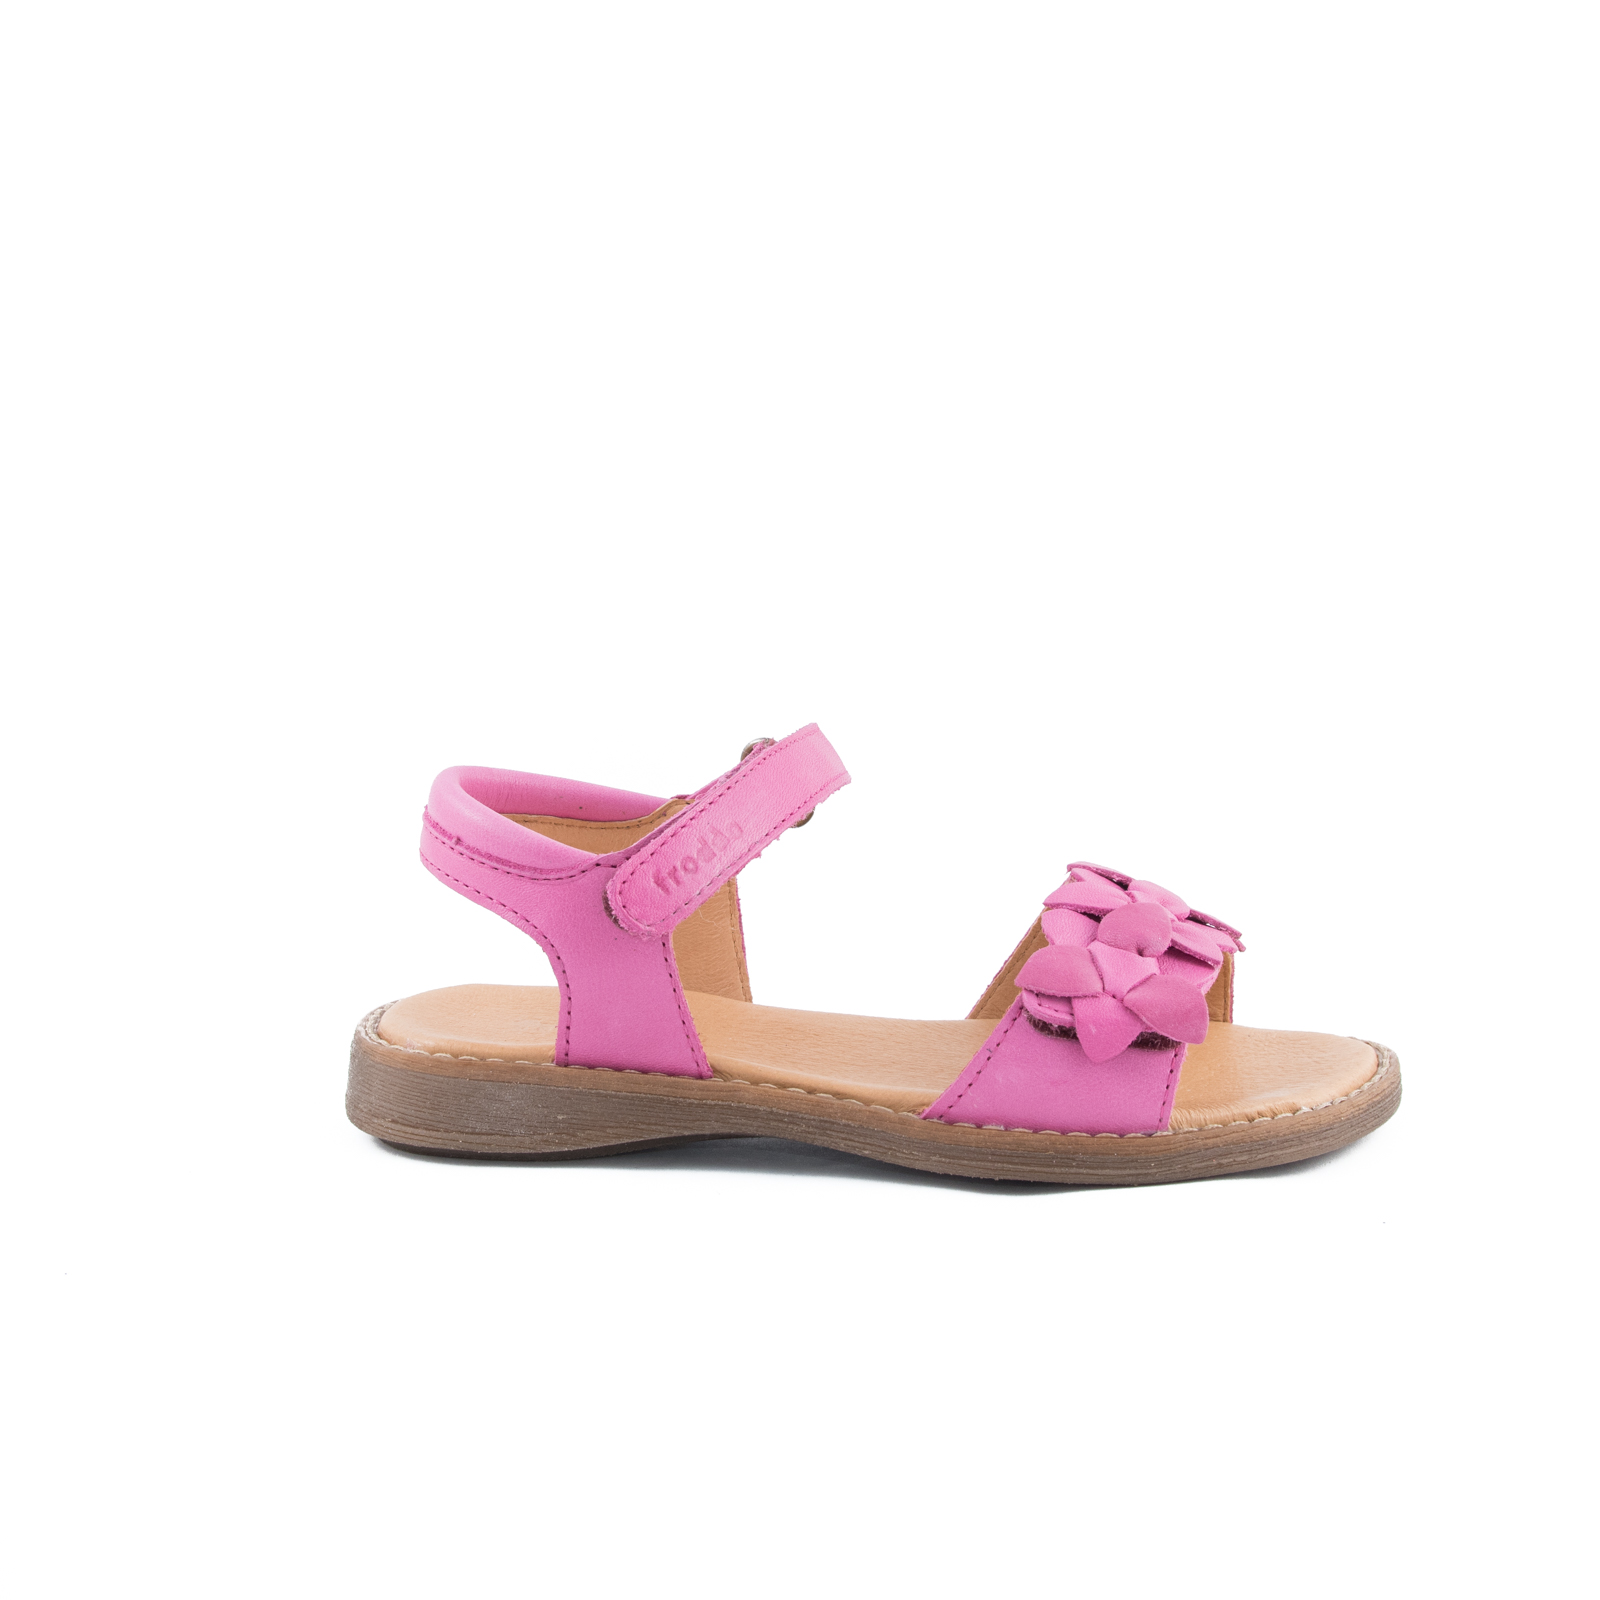 FRODDO Sandals Fuchsia G3150128